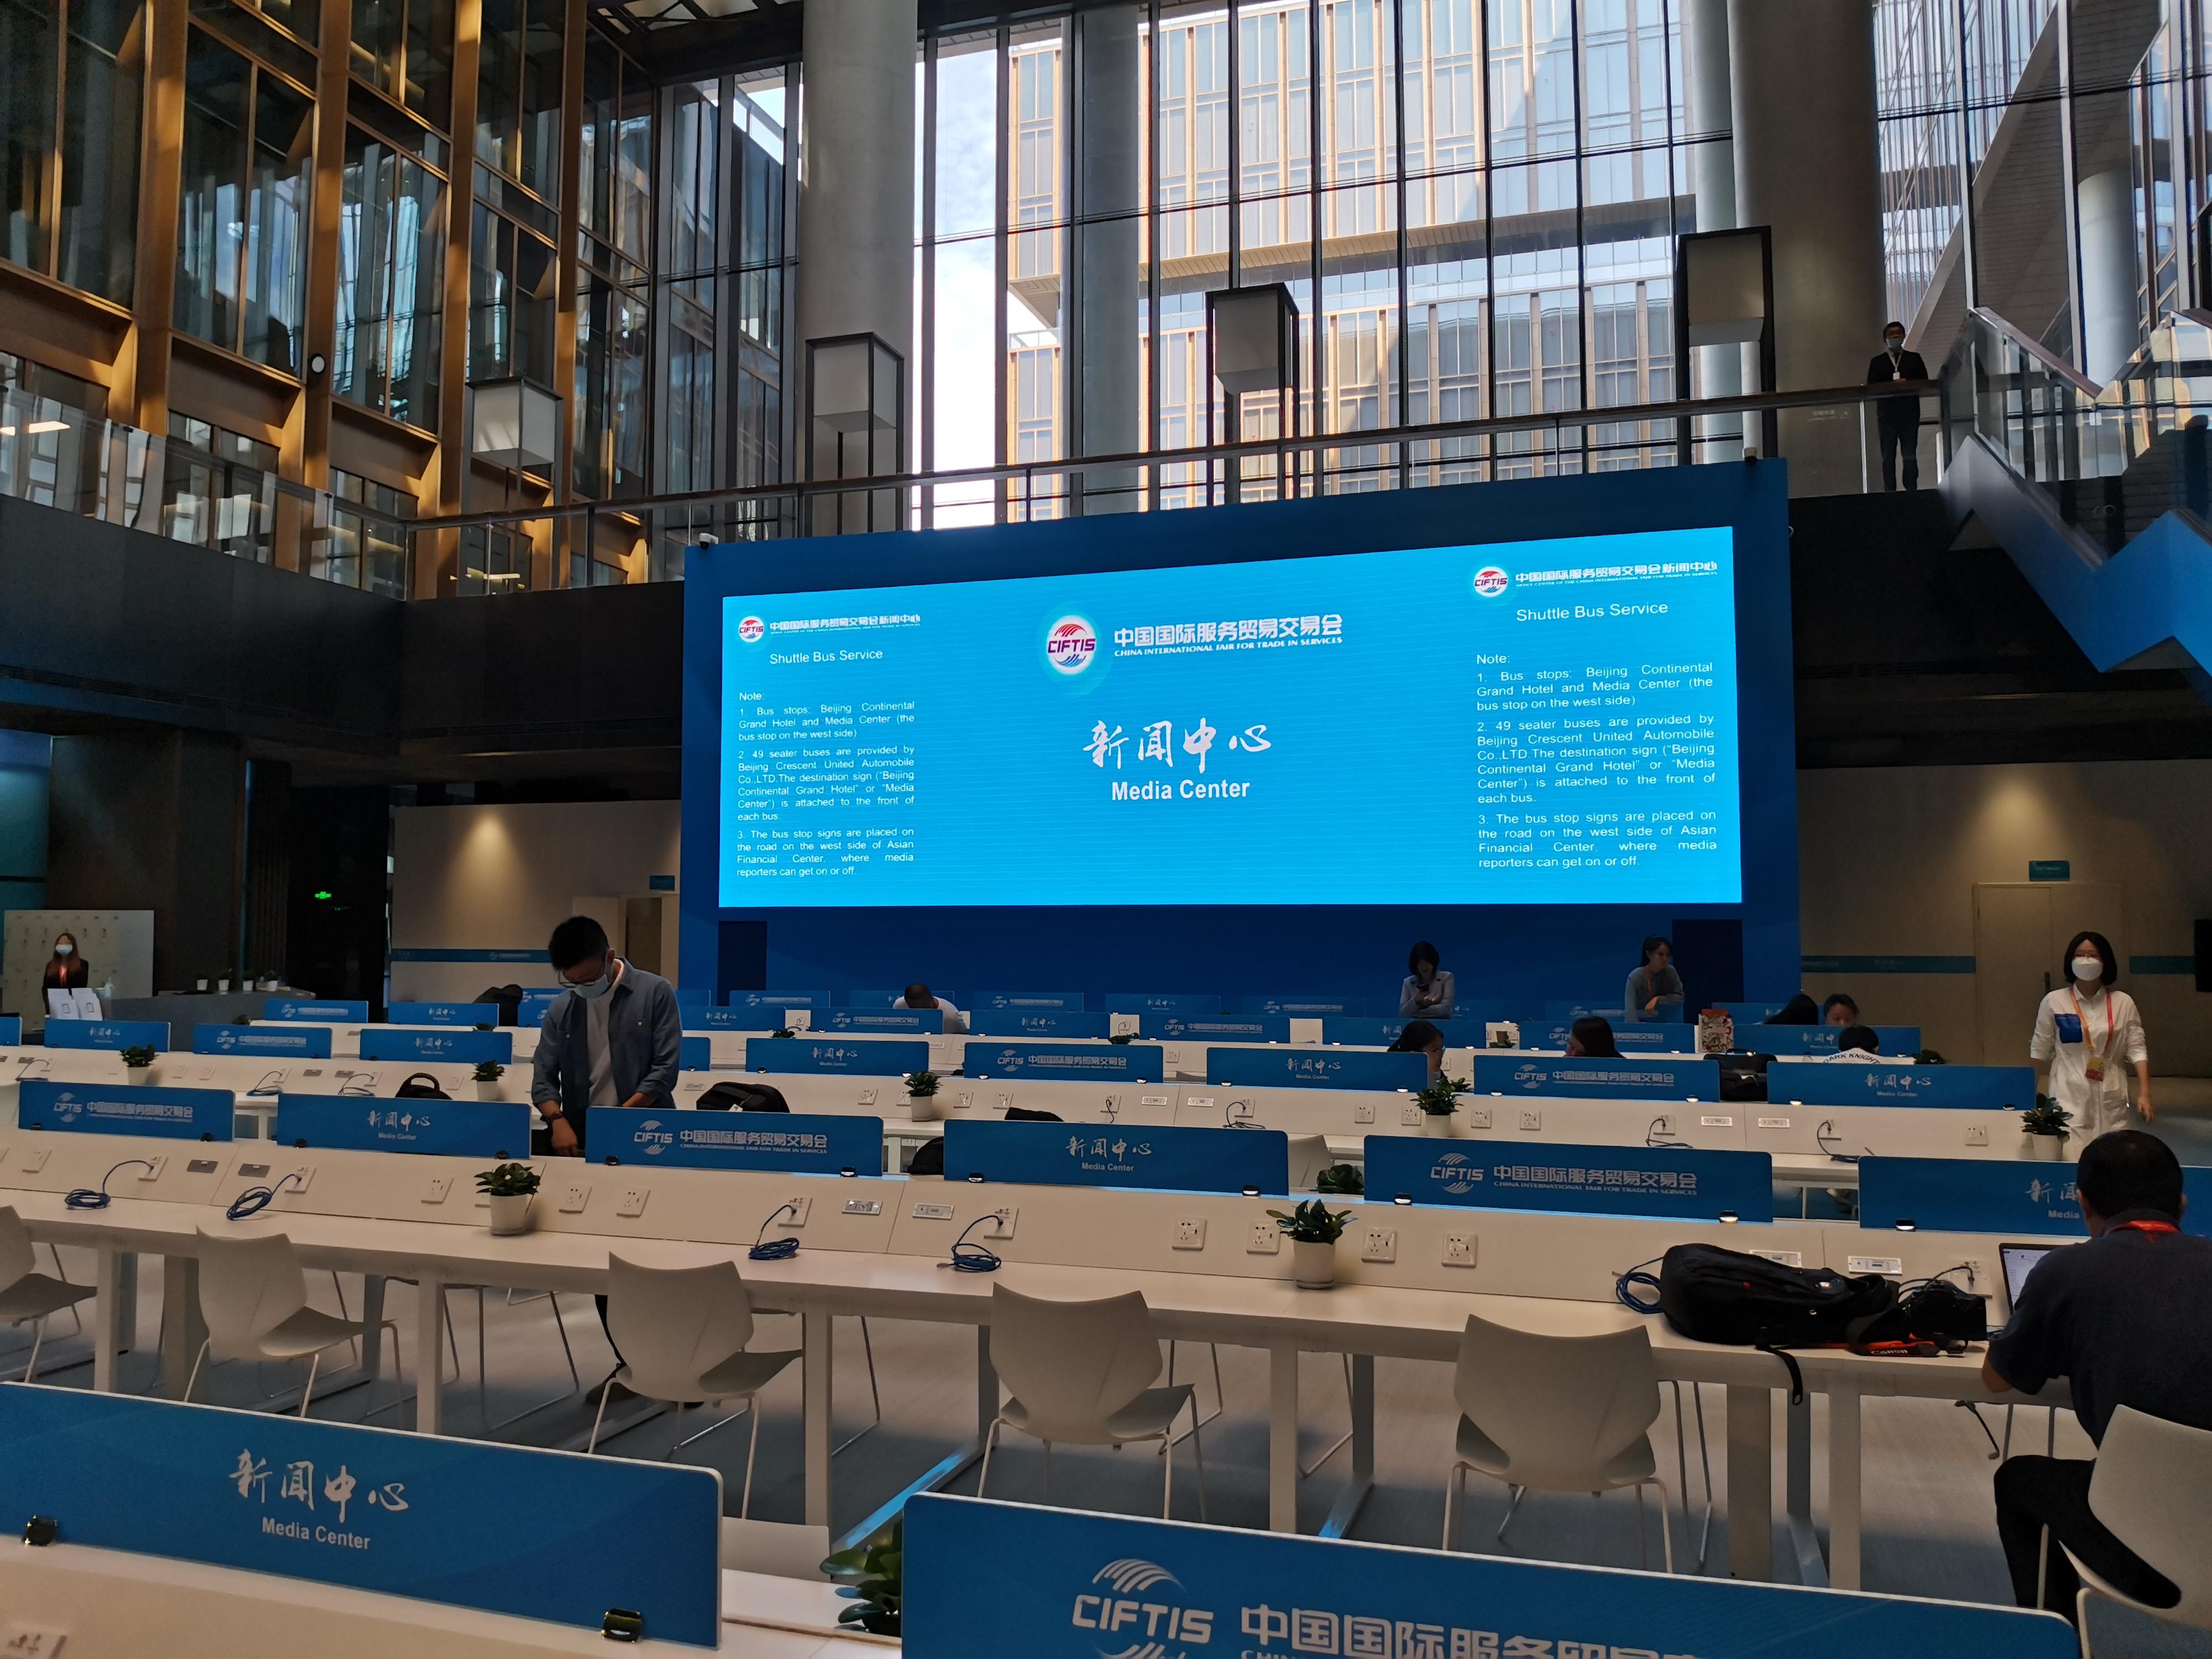 Media center prepares for opening of CIFTIS